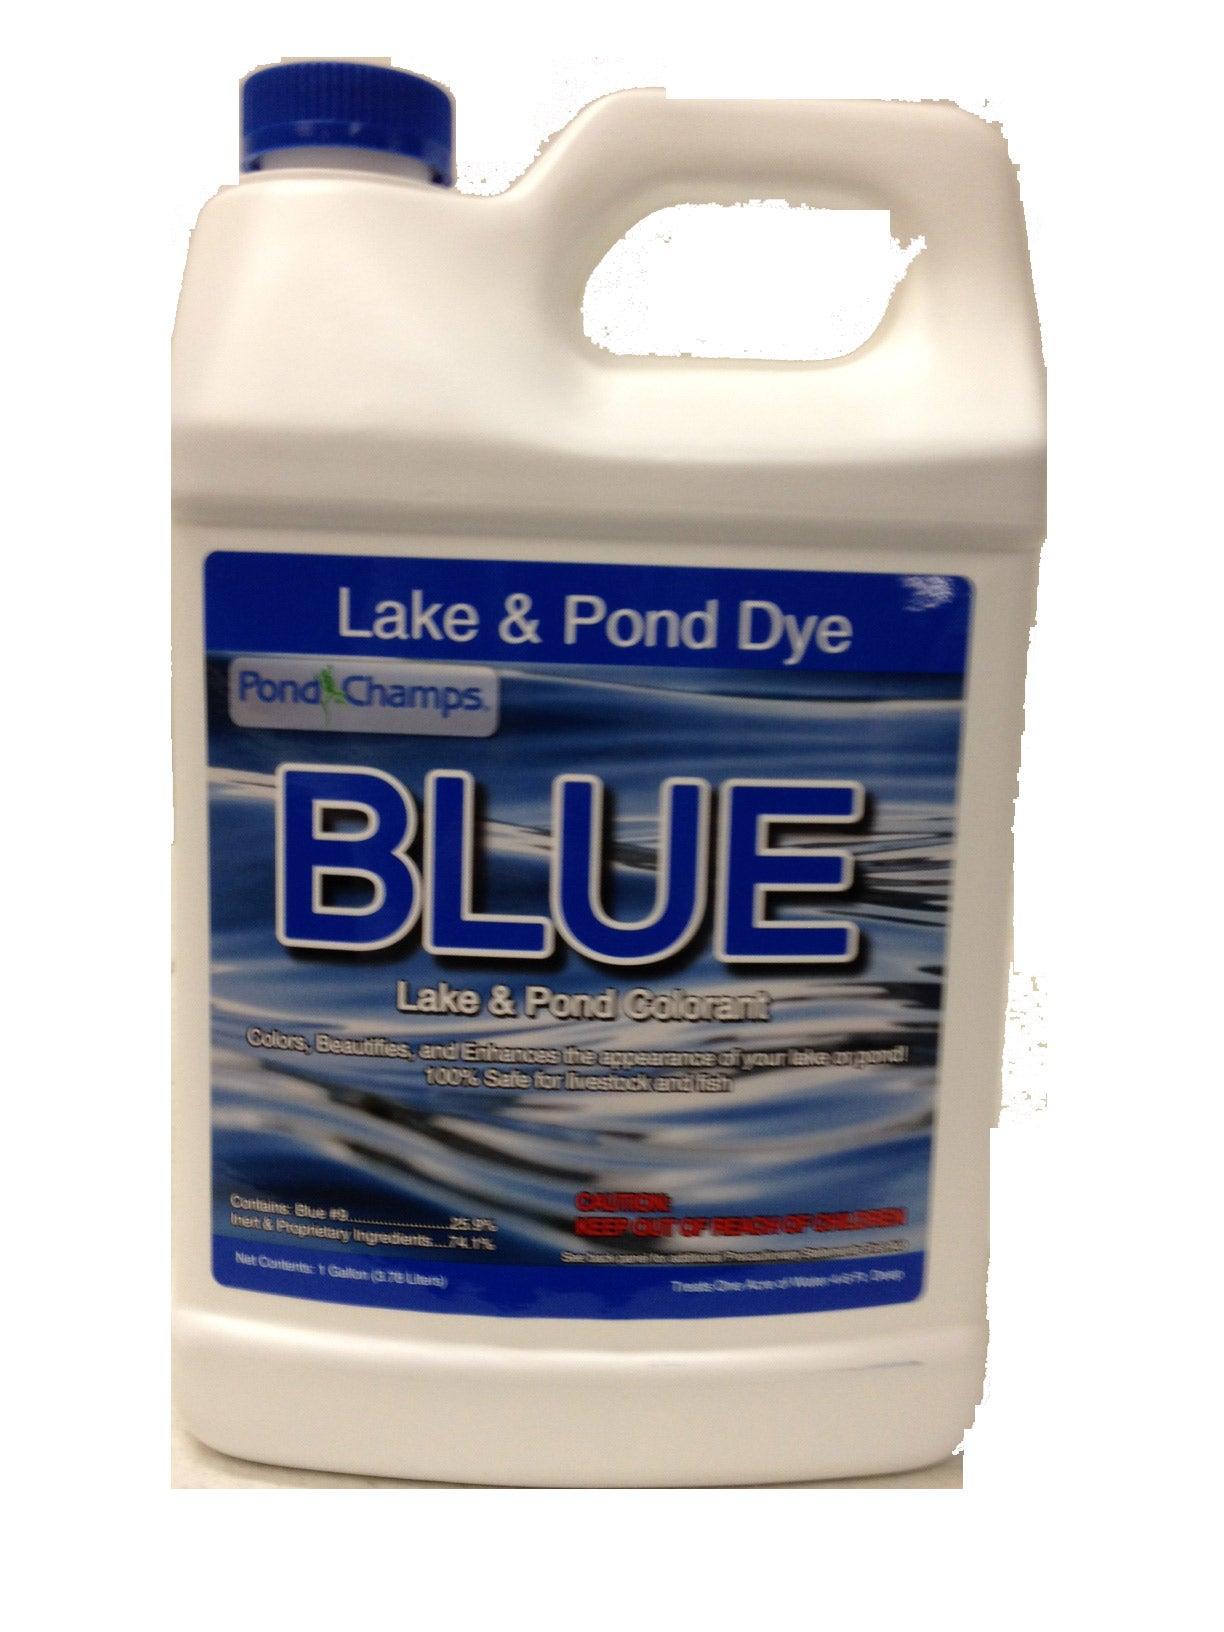 Pond champs blue pond dye colorant 1 gallon ebay for Blue pond dye